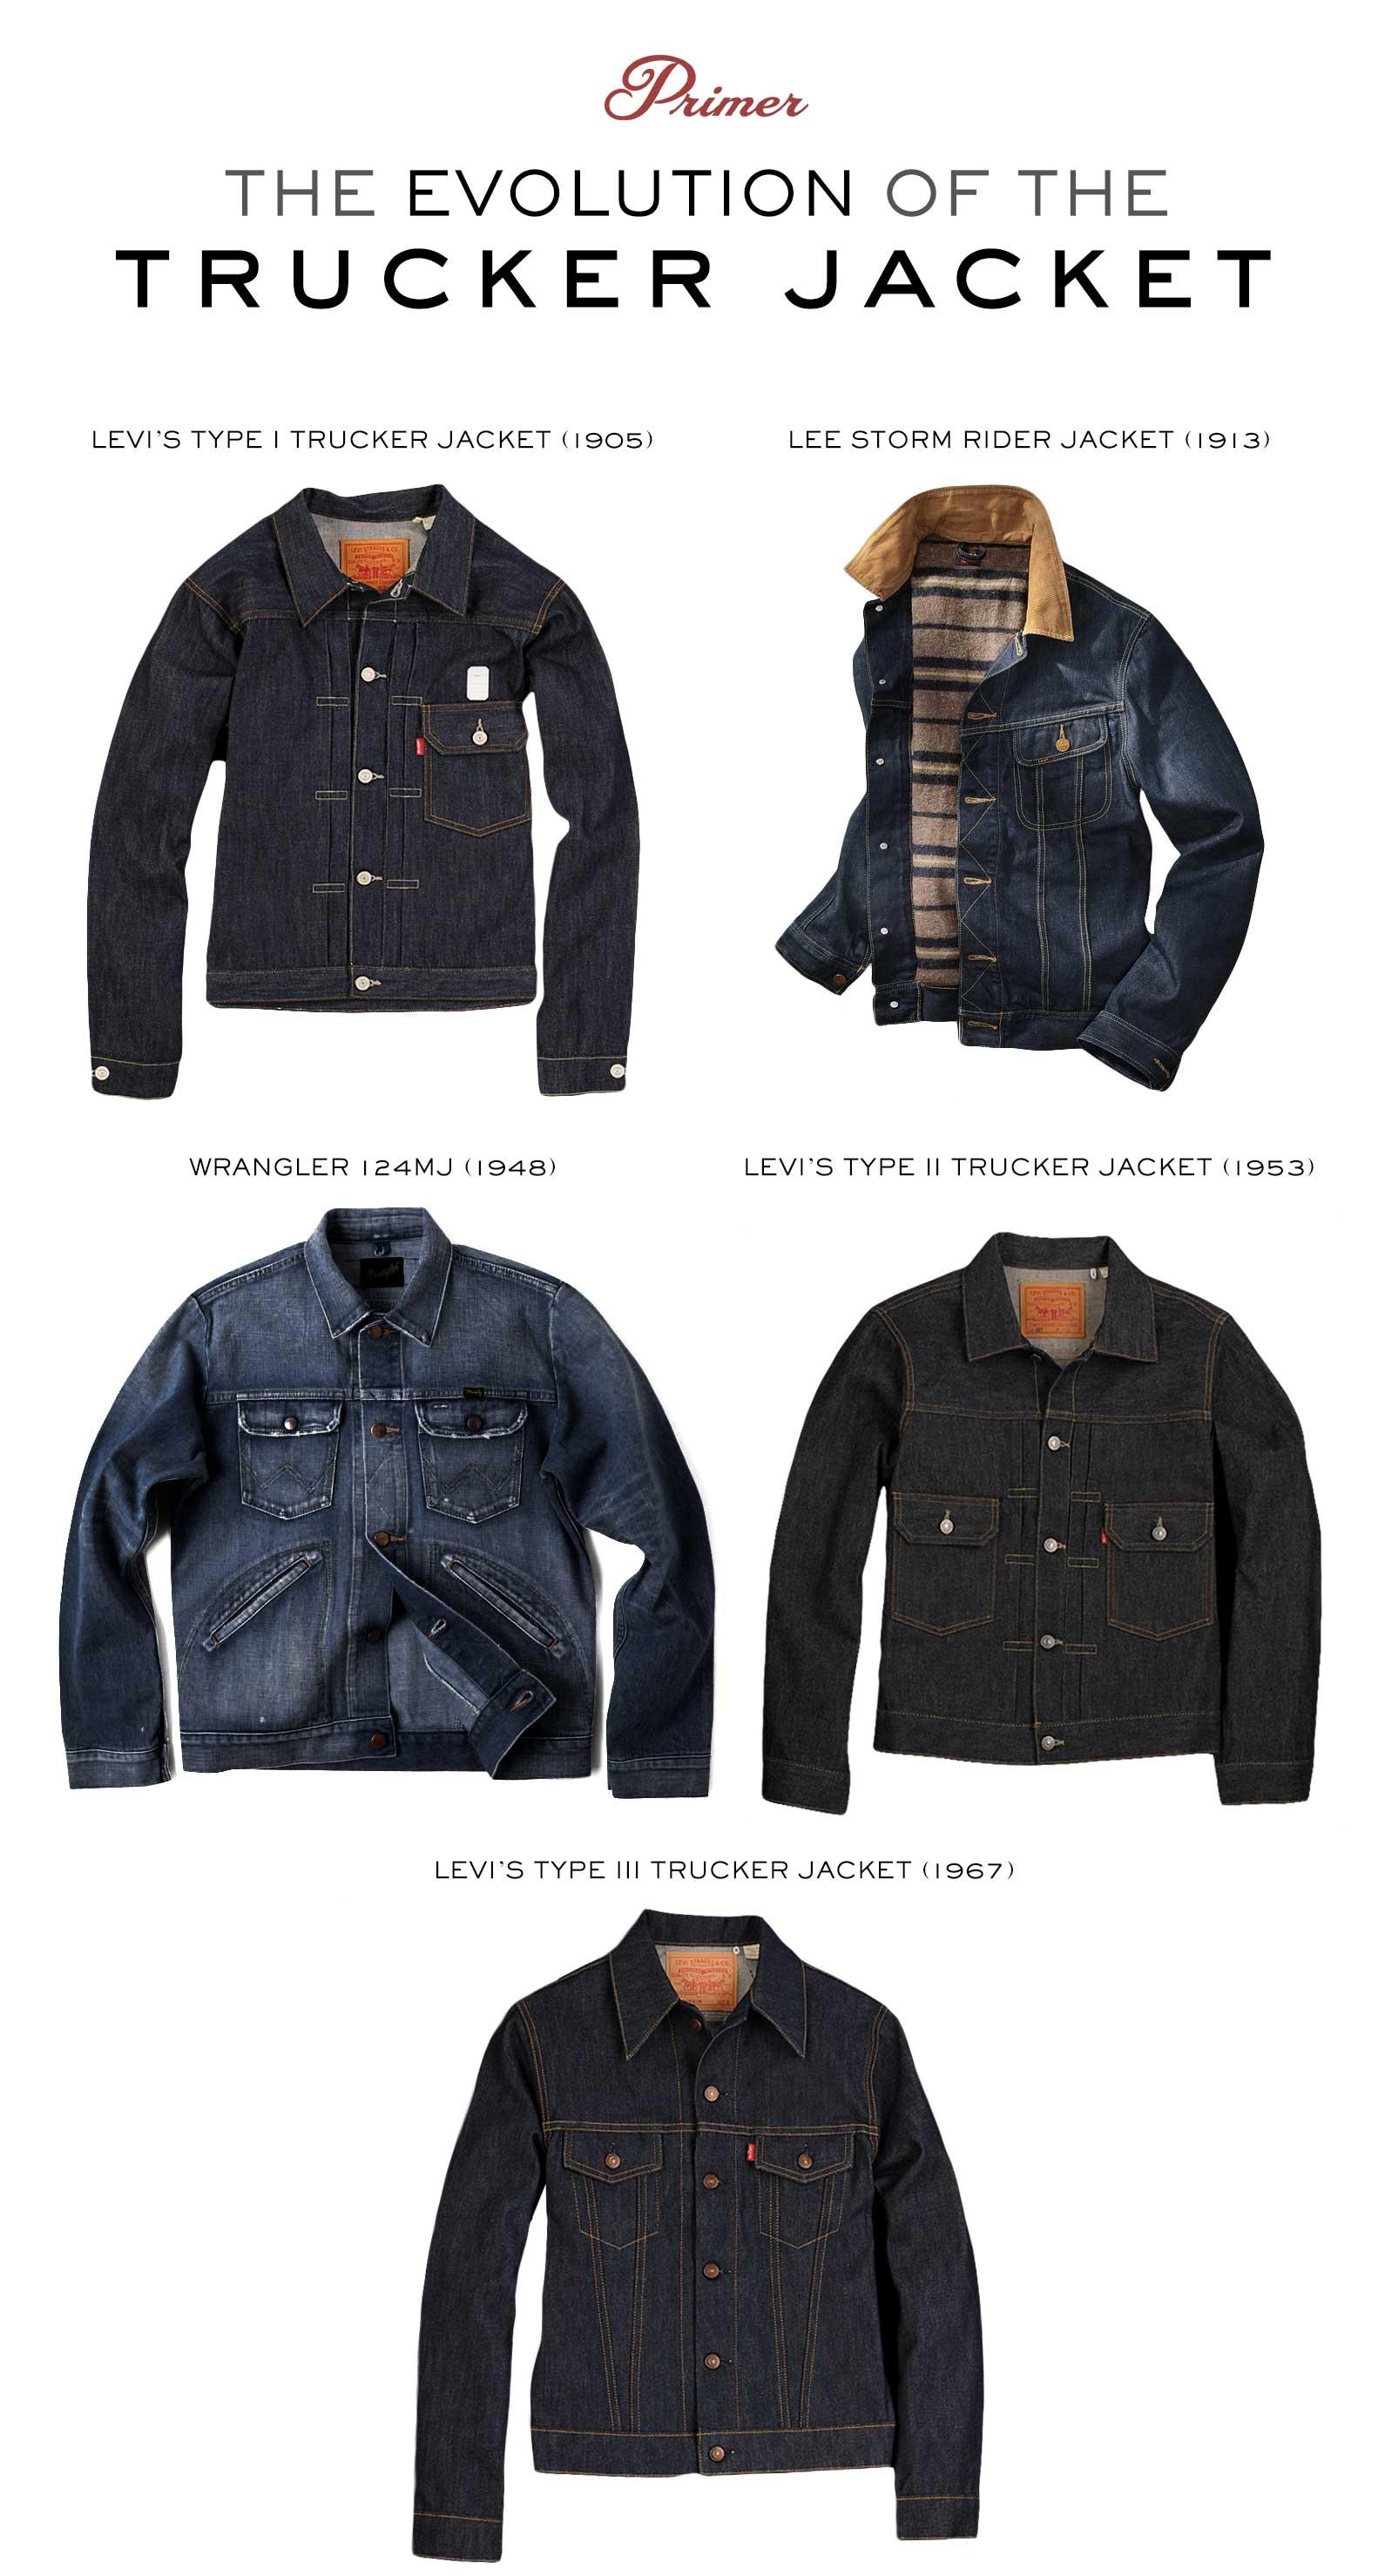 The Evolution of the Denim Trucker Jacket